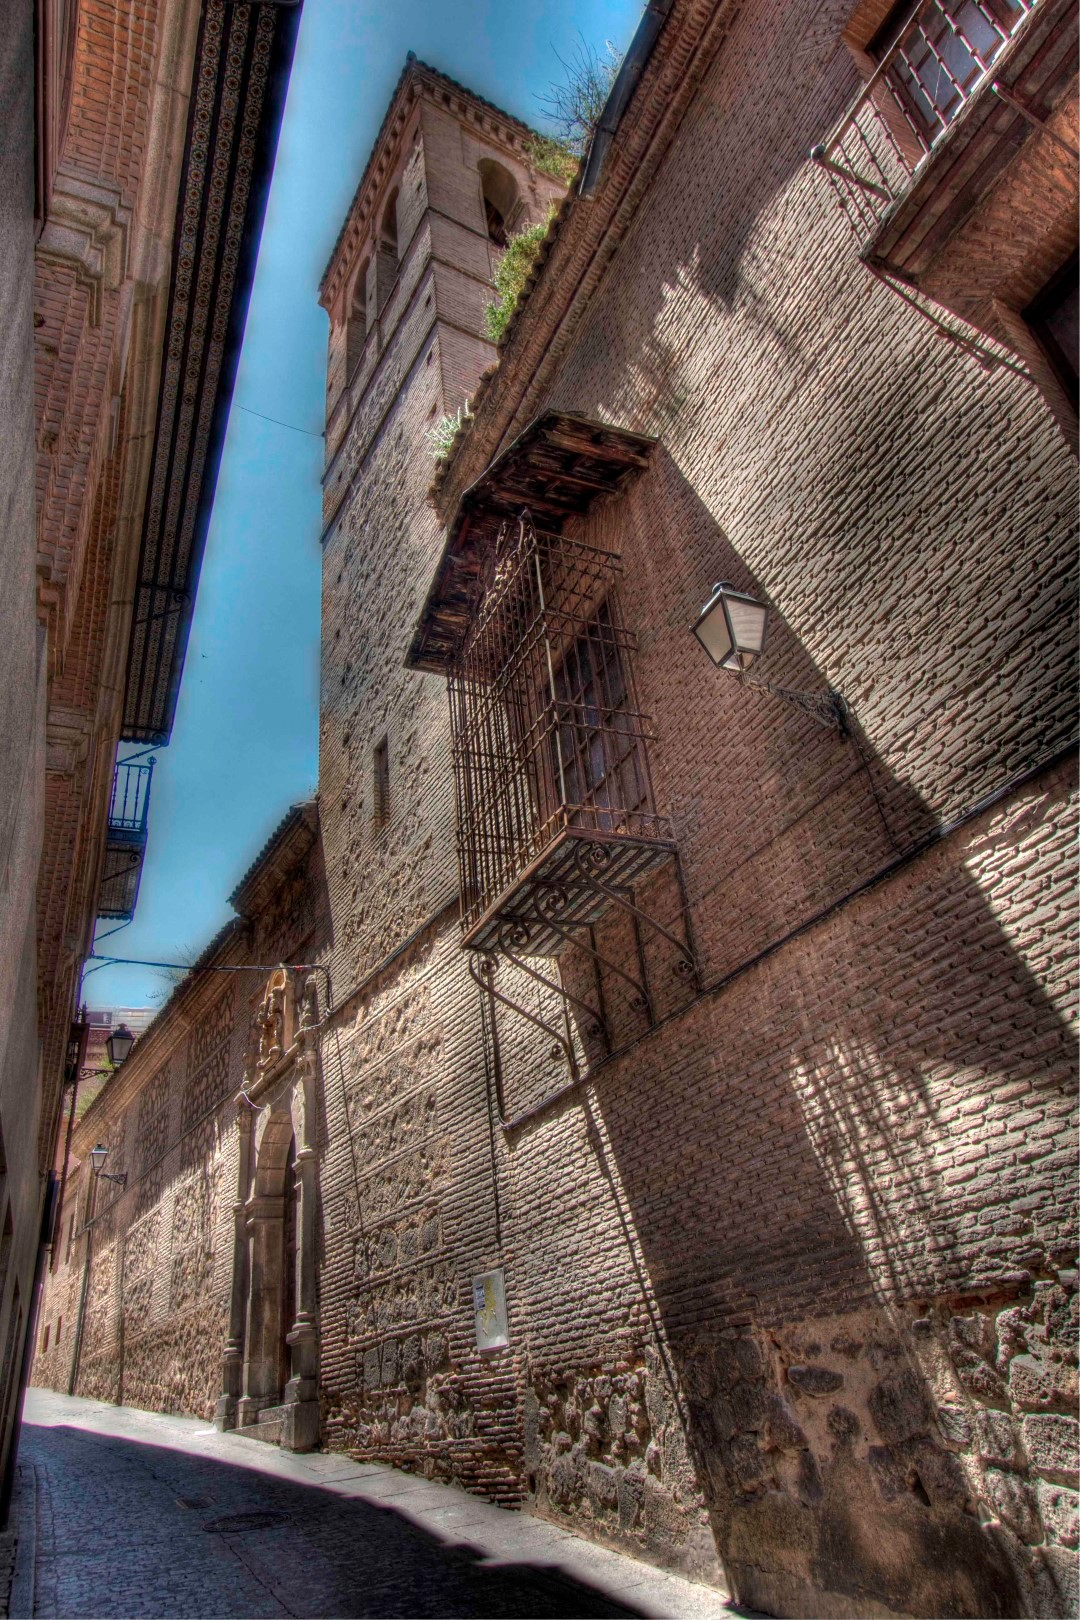 Toledo, balcony, shadows, Spain, Travelers Roundtable, Robert Bundy